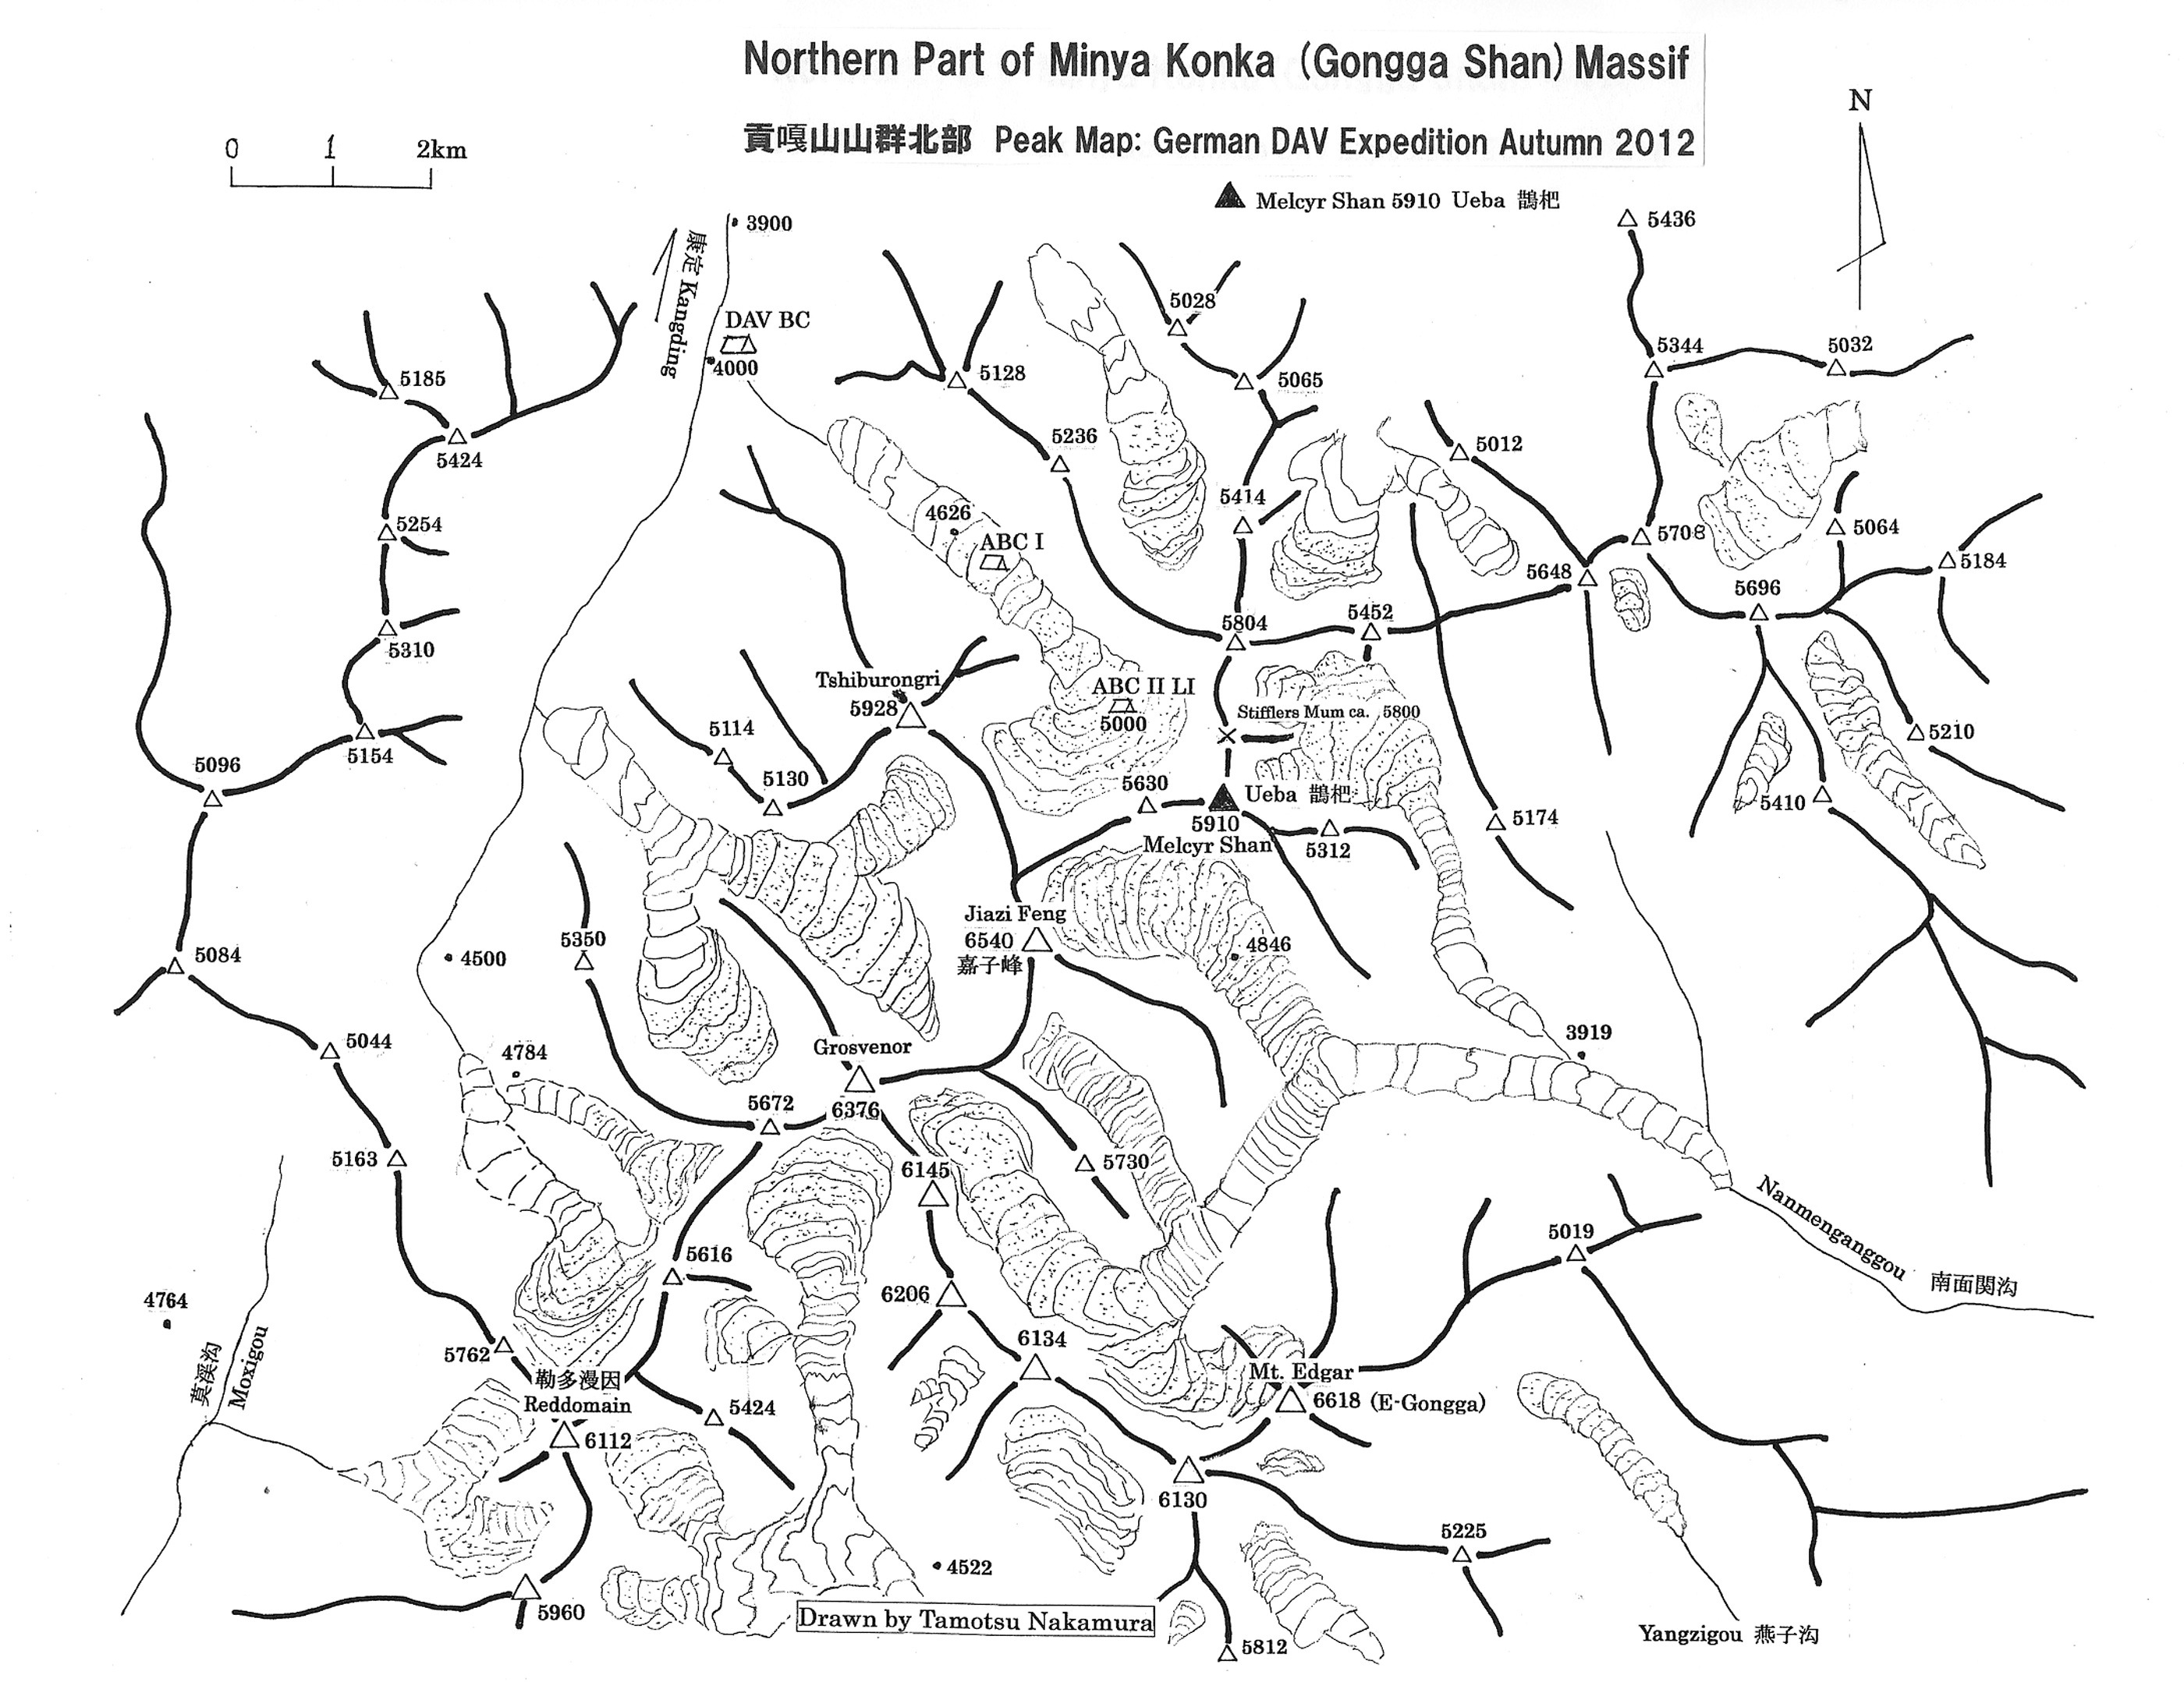 Map of the Tshiburongi area.